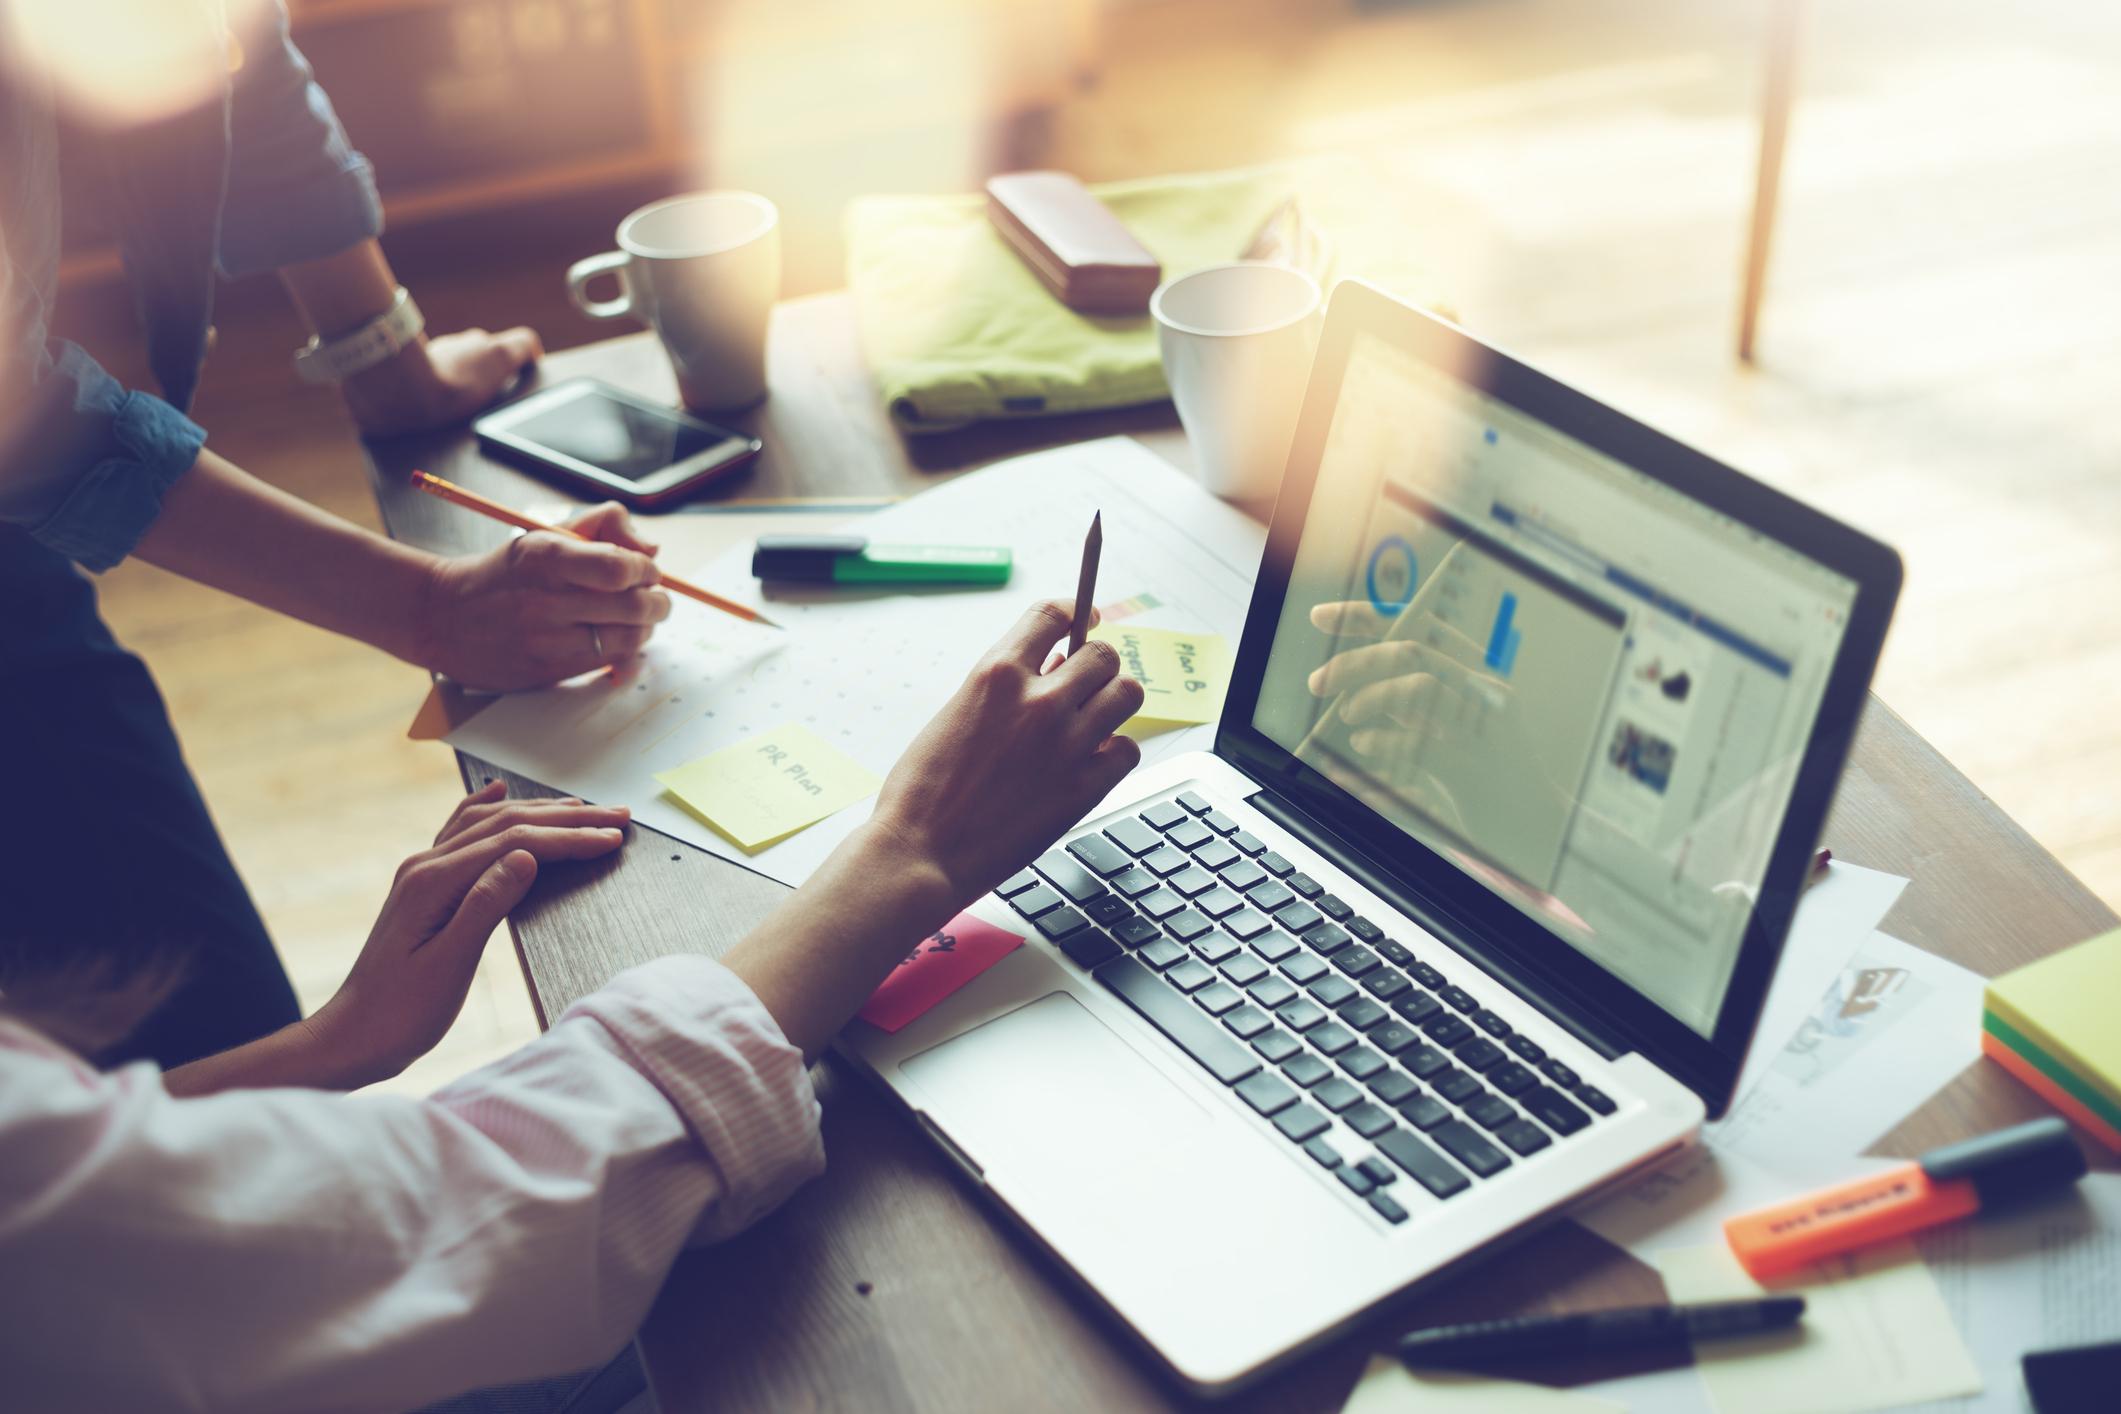 FREE DIGITAL MARKETING REVIEW - Get a free 30 minute review of your current digital marketing activity.